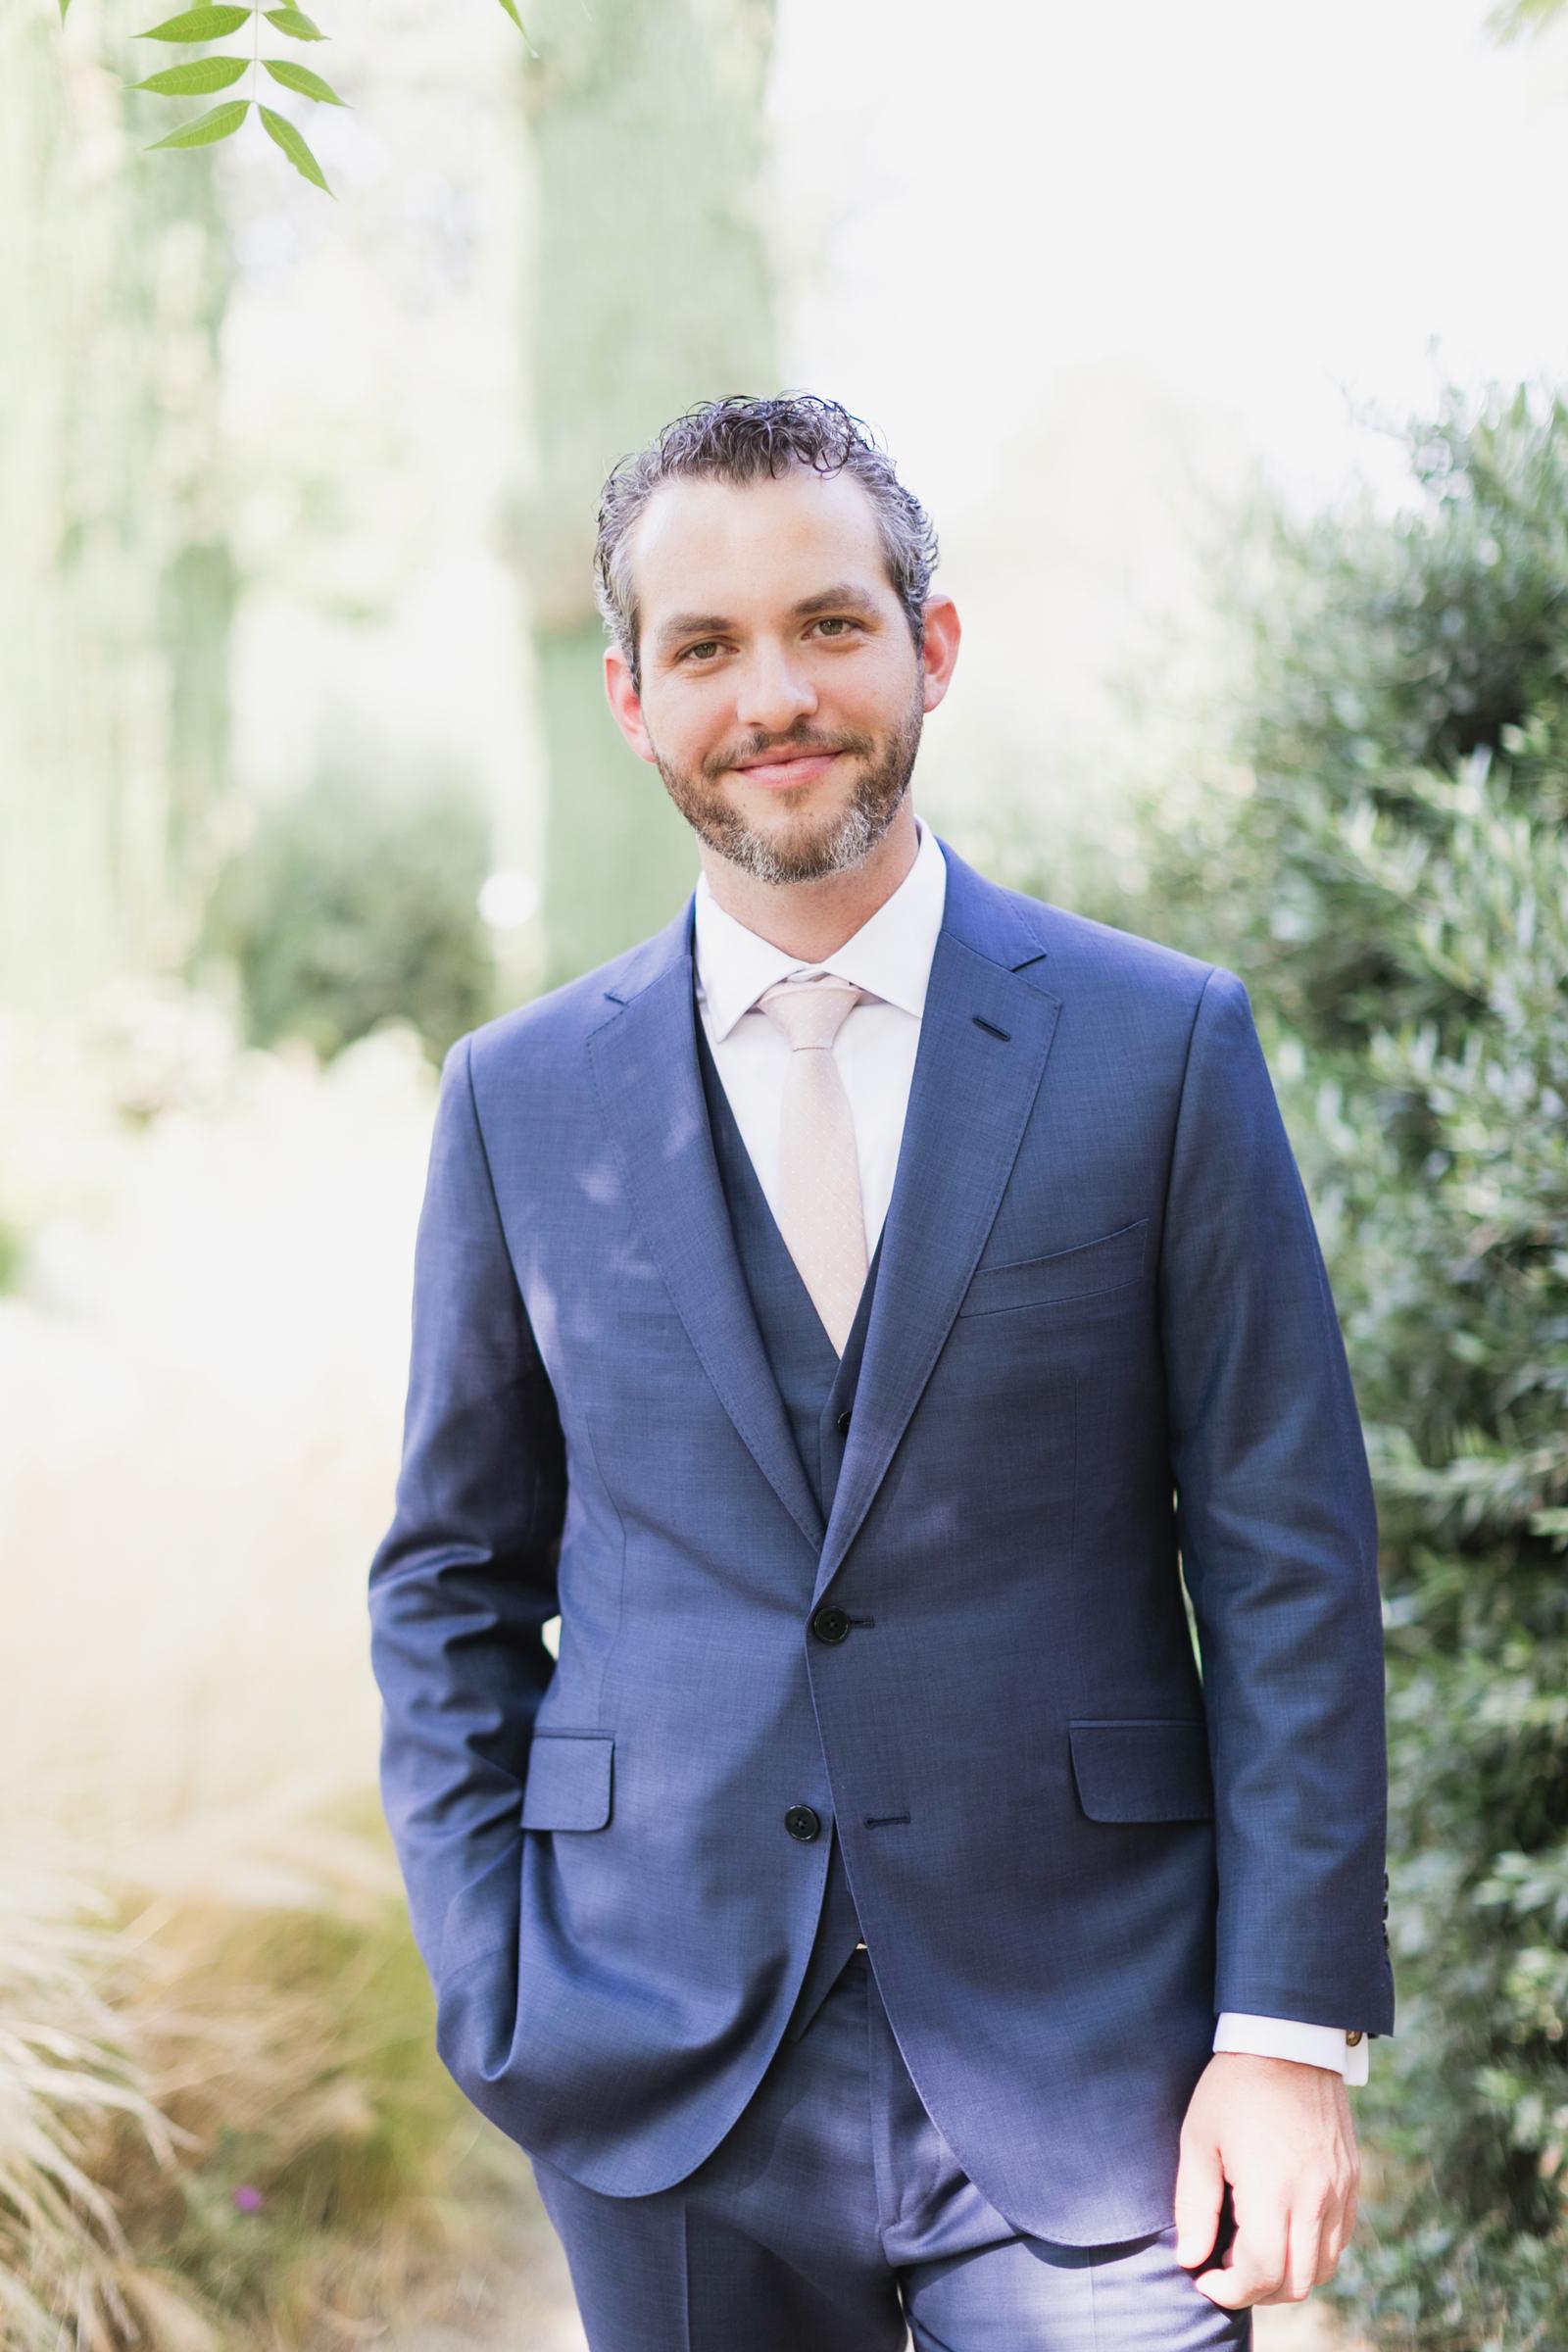 blue custom three-piece Trumaker suit with cream colored tie